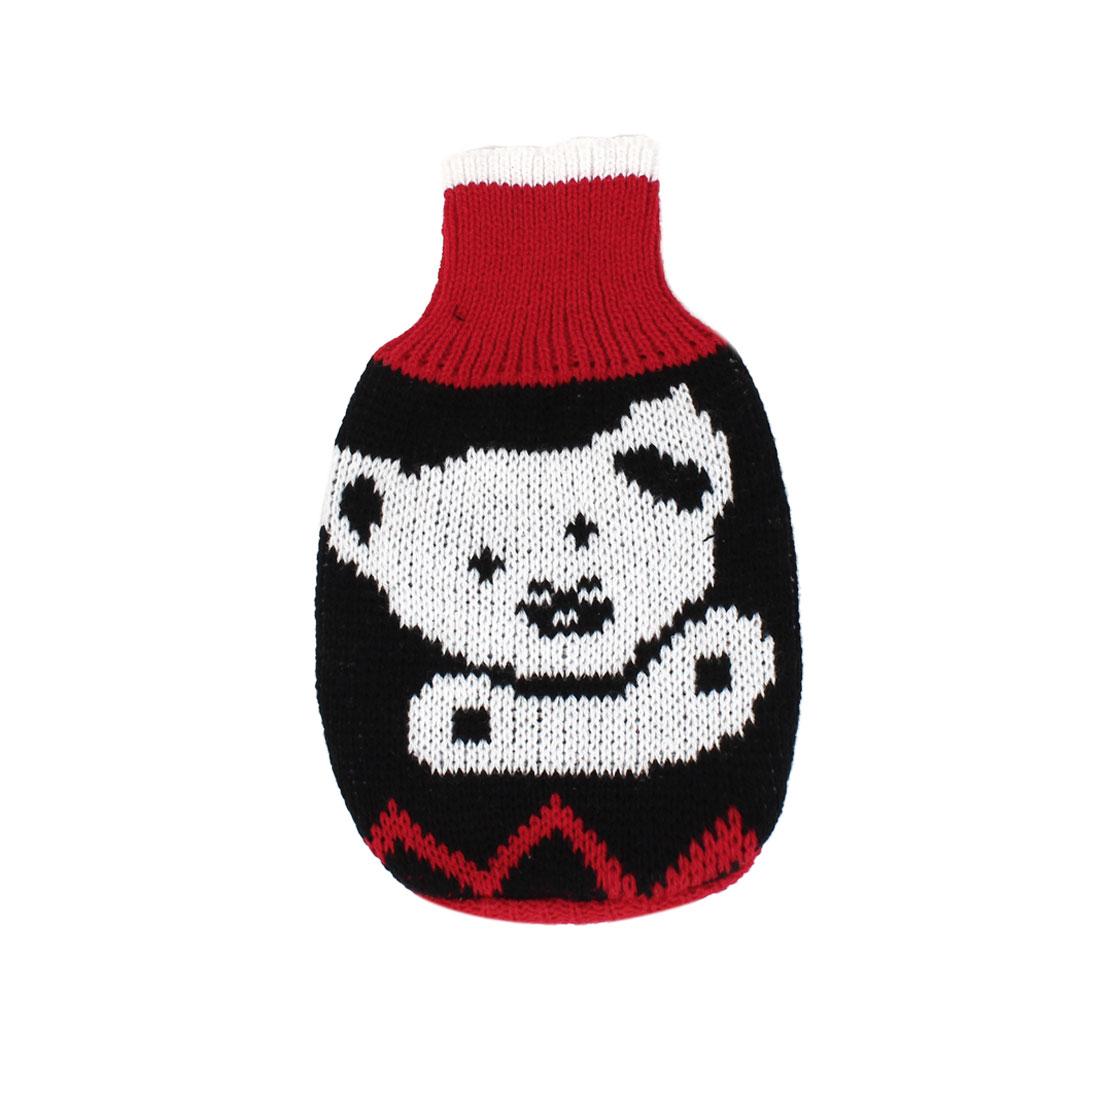 Pet Dog Puppy Ribbed Cuff Knitwear Turtleneck Apparel Sweater Red Black Whtie Size XXS